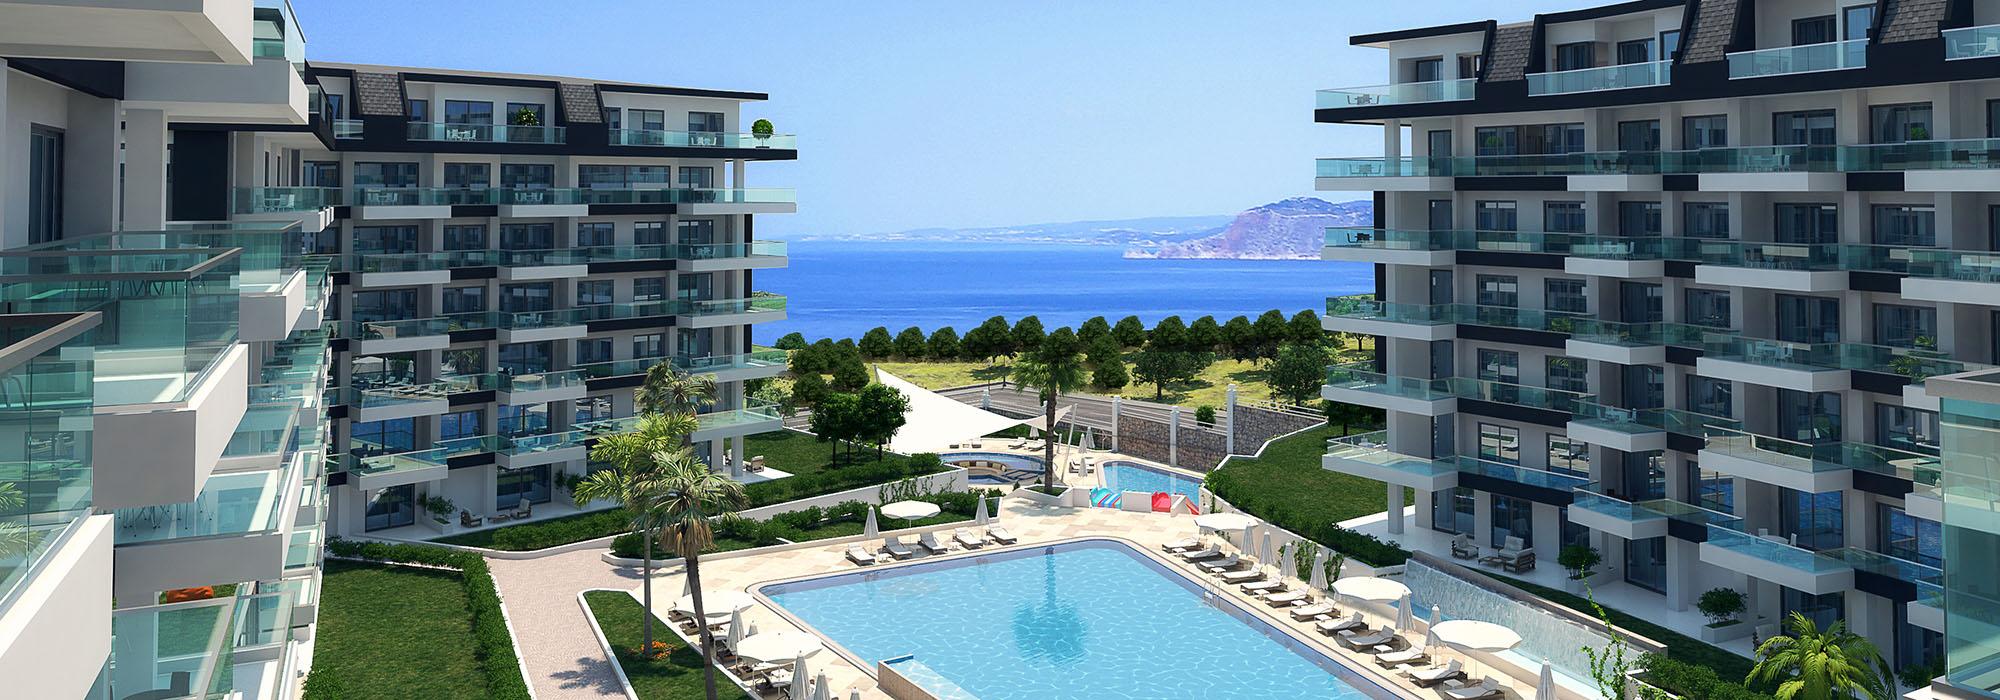 Luxueuse résidence au bord de la mer à Alanya Kargicak